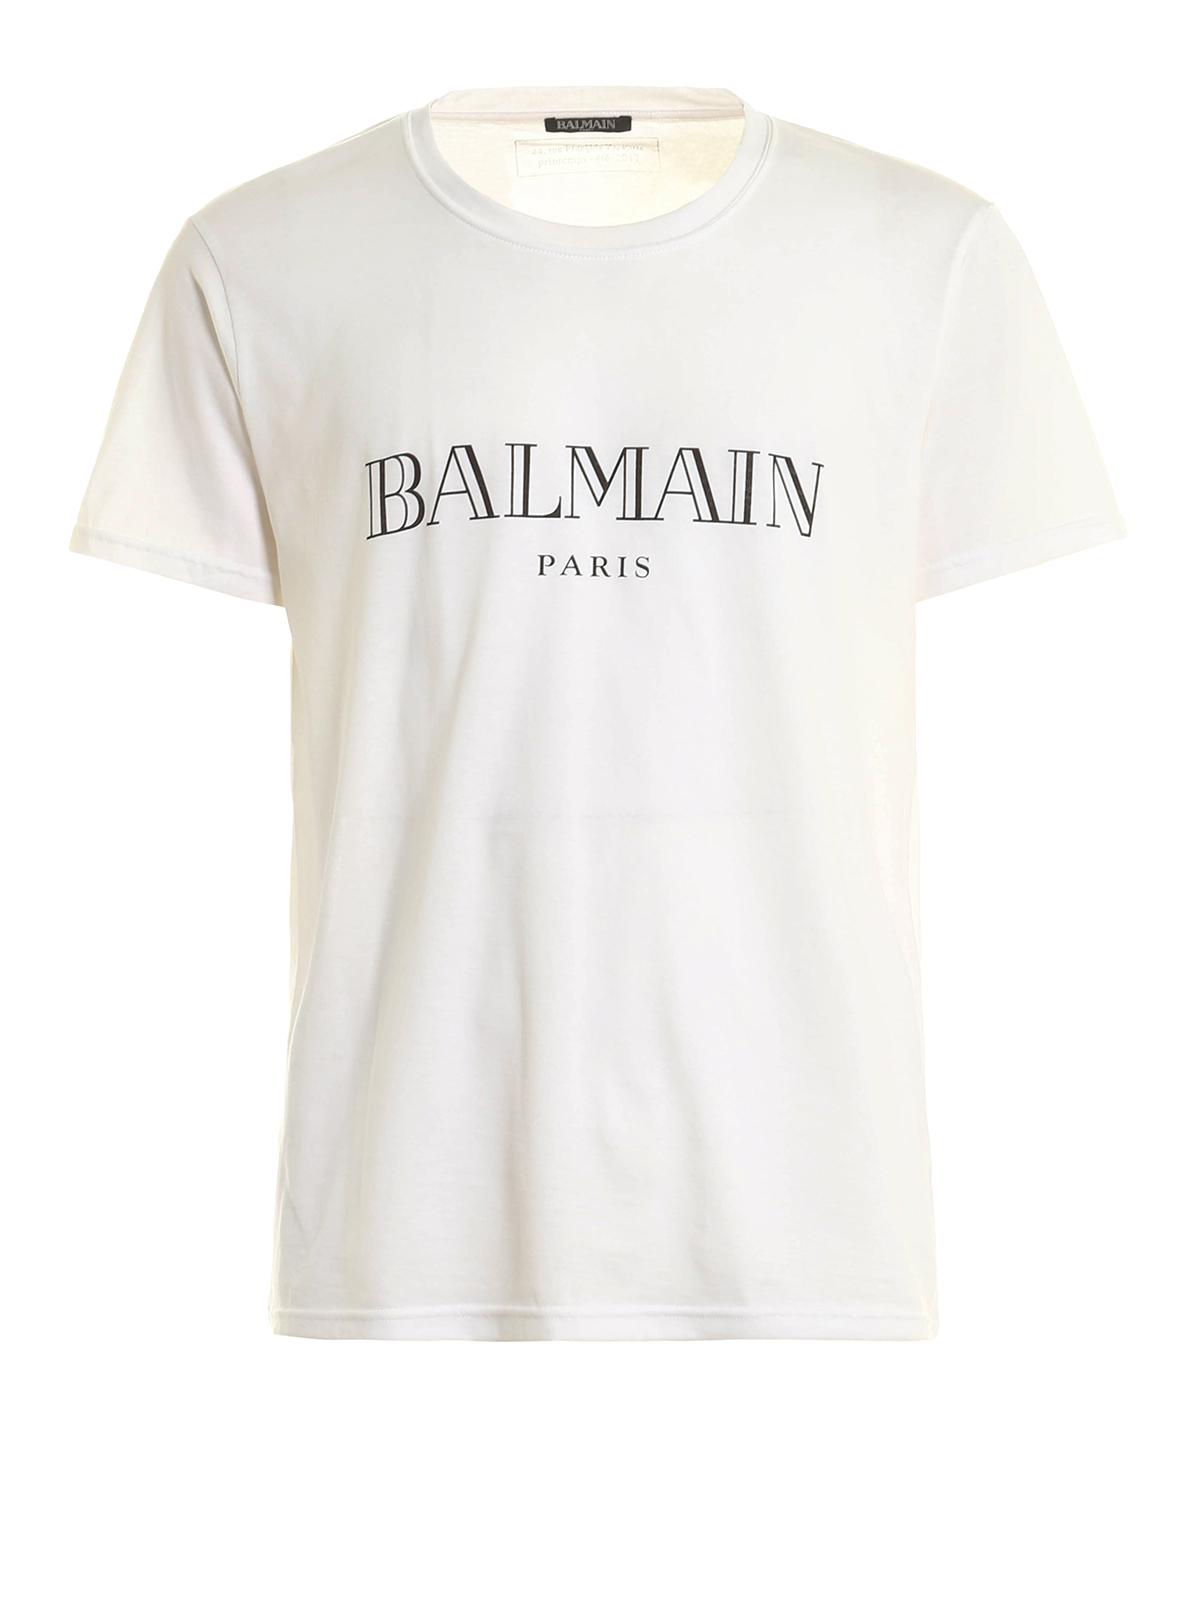 Logo print jersey t shirt by balmain t shirts ikrix for Balmain white logo t shirt